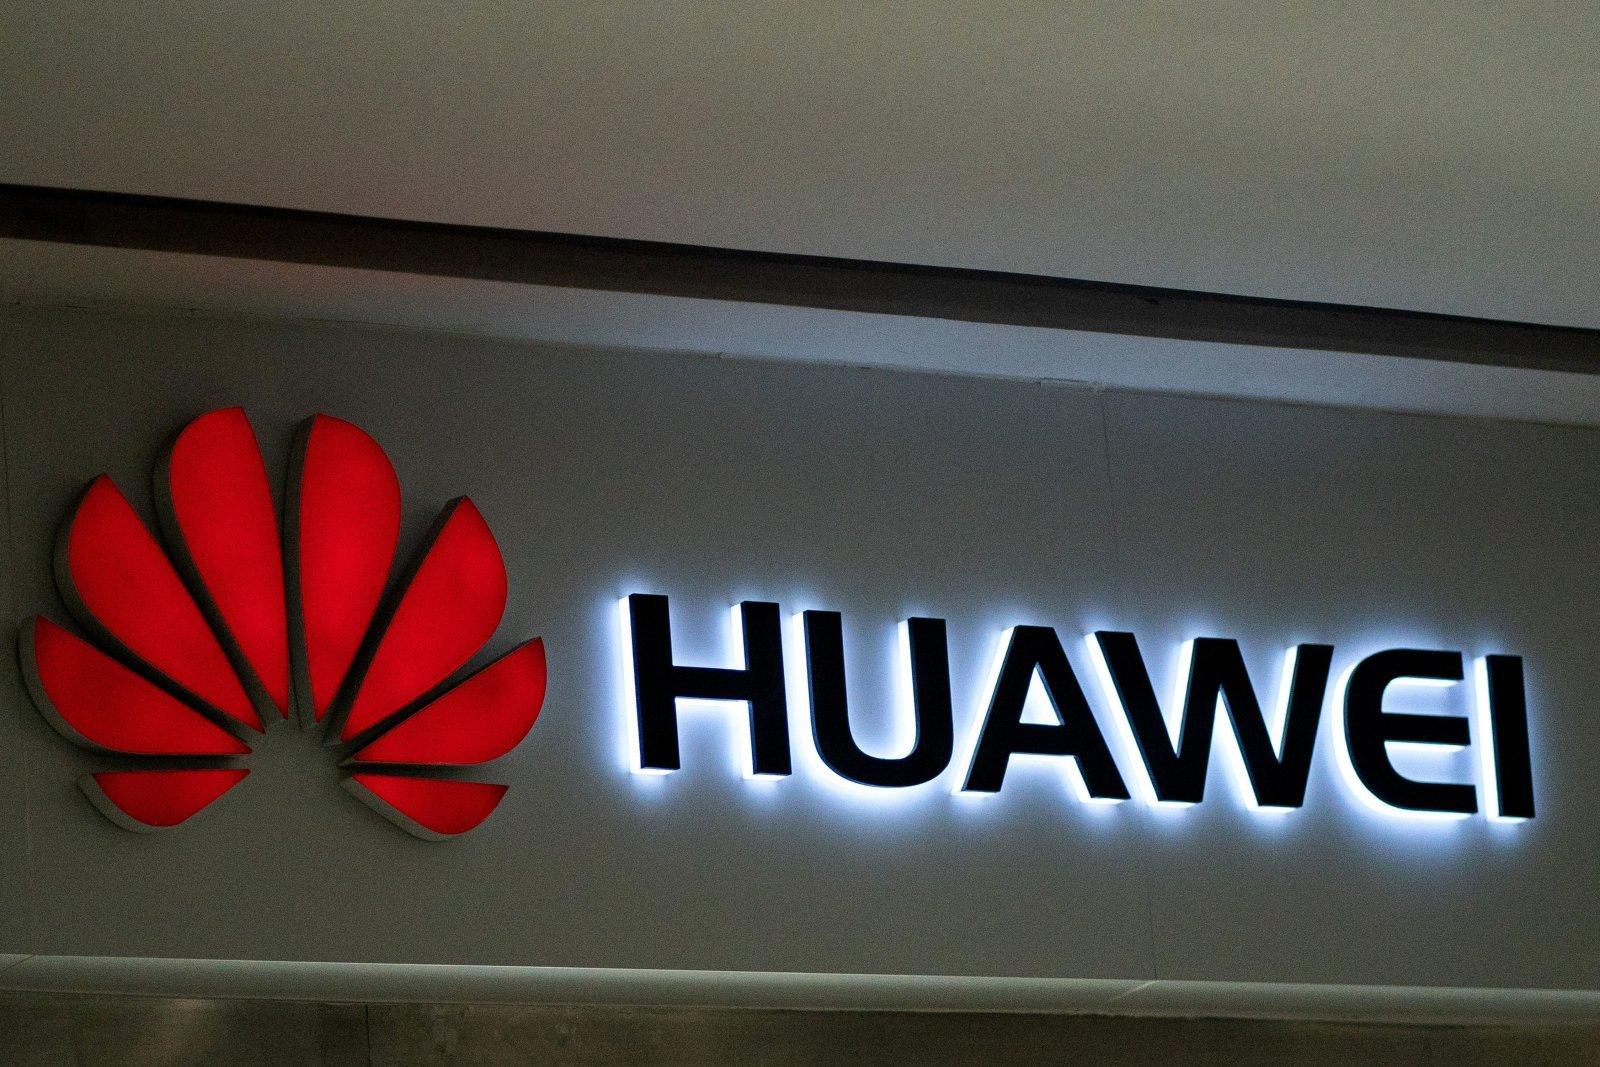 हुवावे संकटः अब हुवावेका स्मार्टफोनमा मेमोरी कार्ड हाल्न नमिल्ने